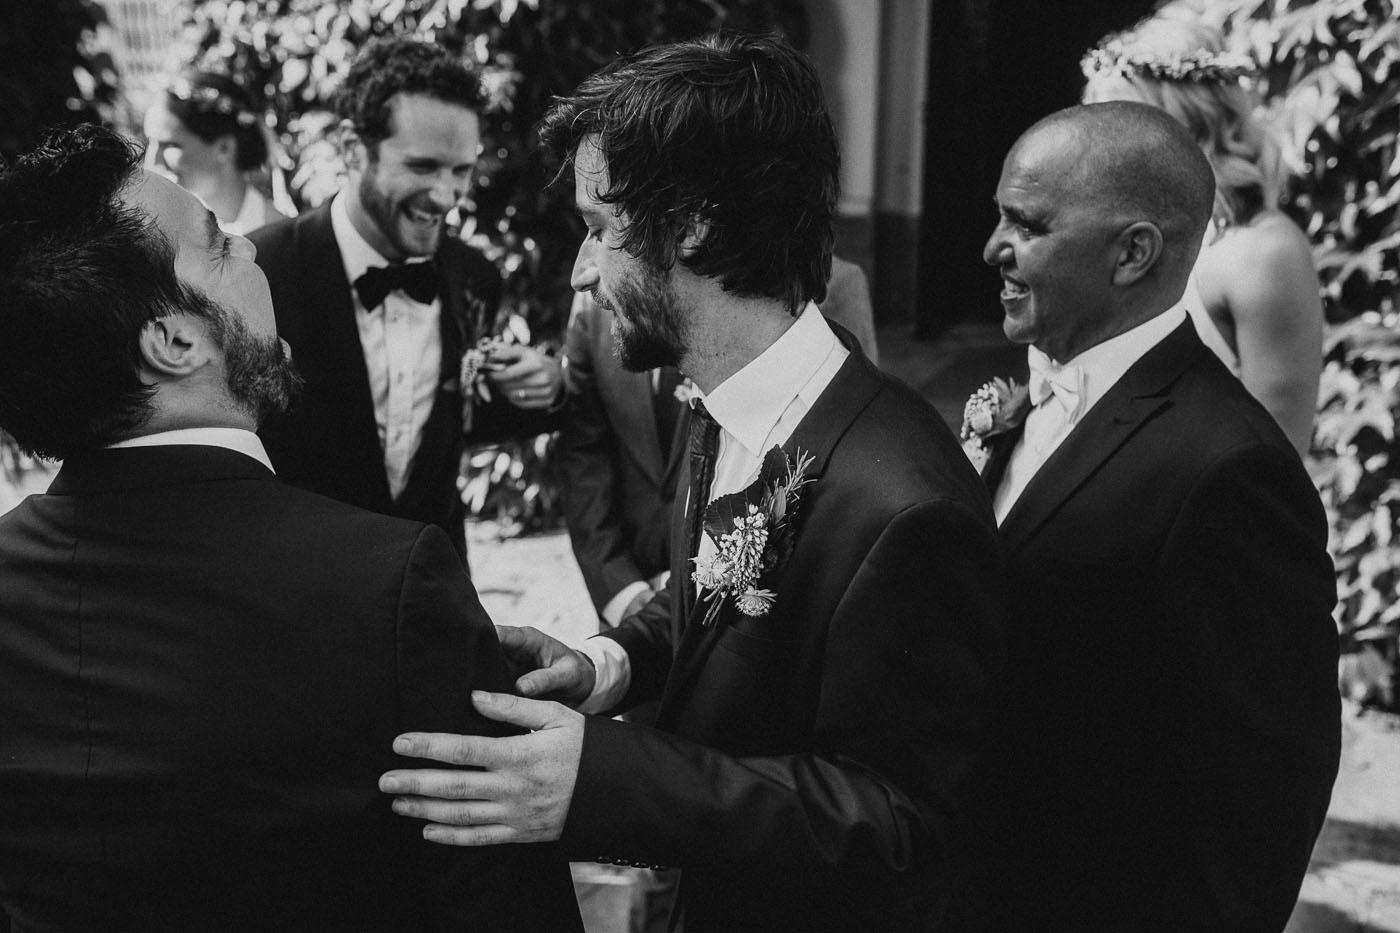 wedding-leopoldskron-photographer-25